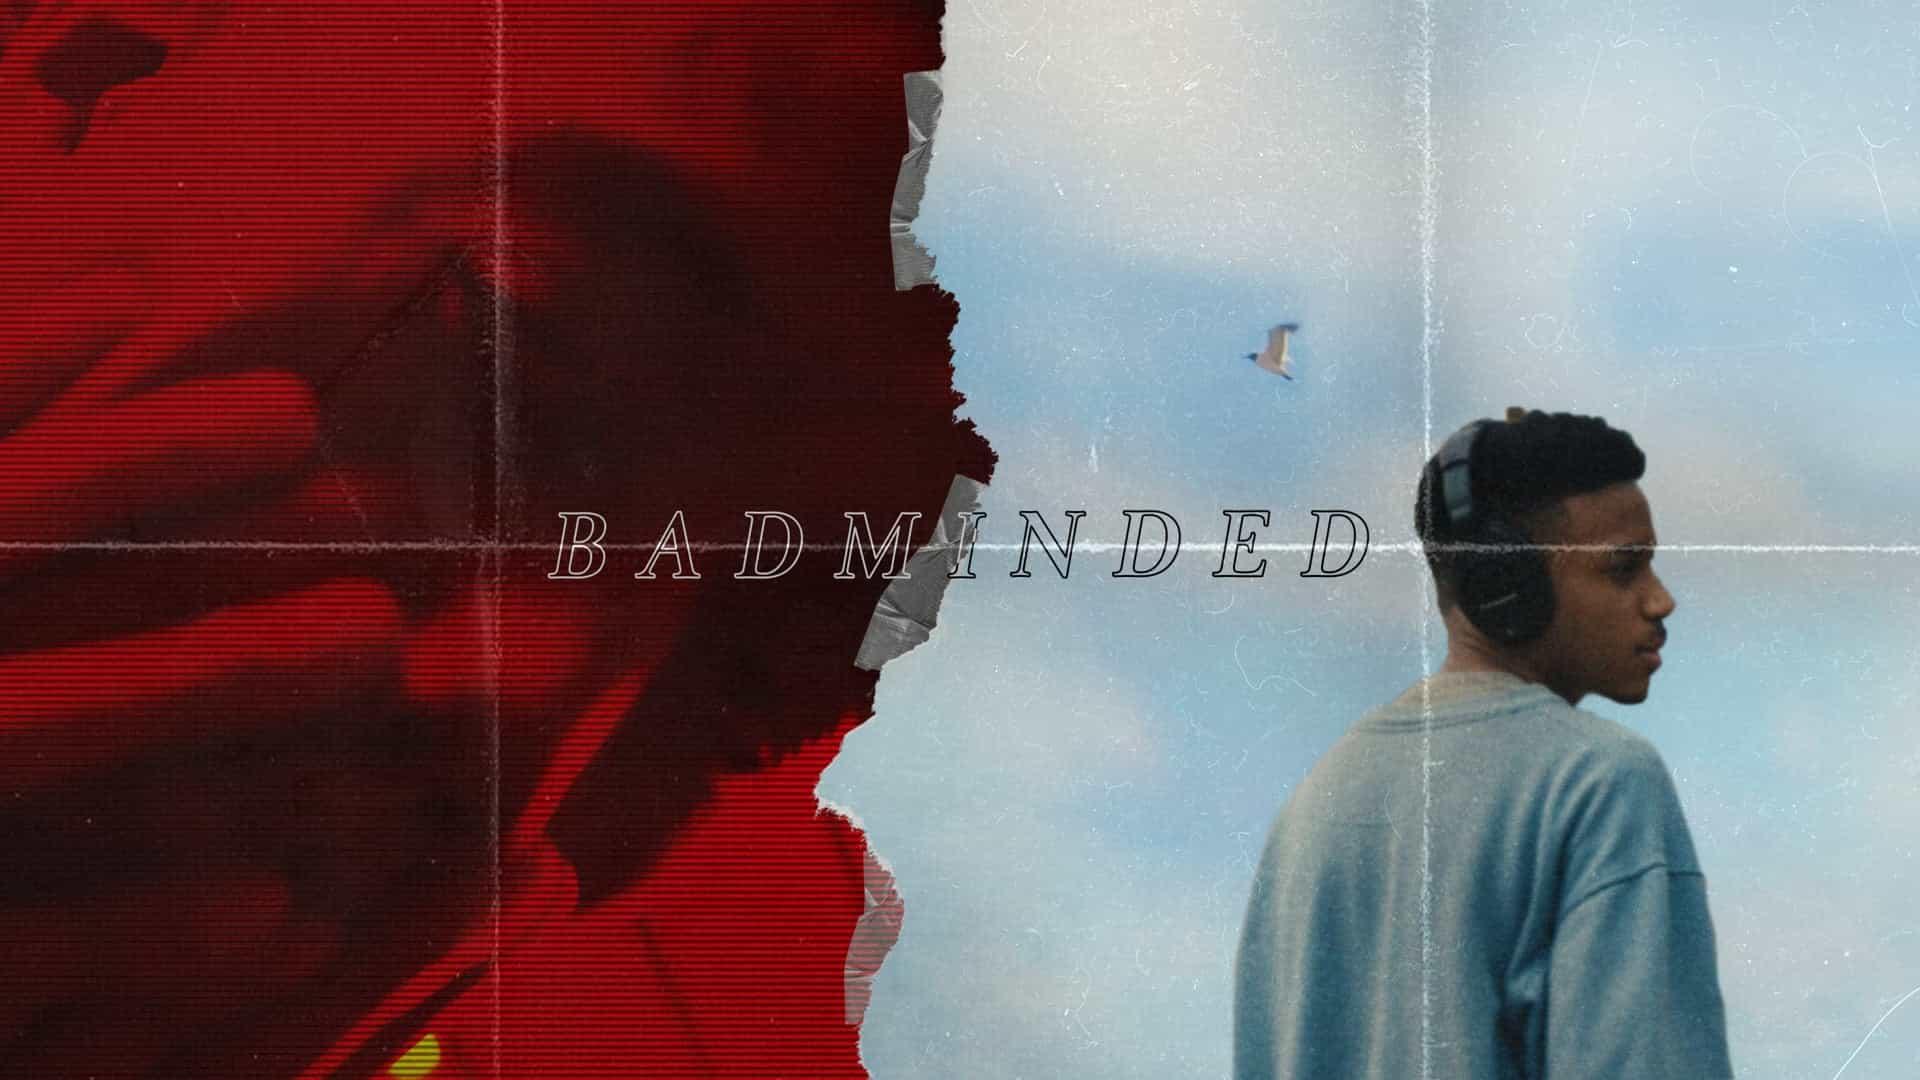 BADMINDED